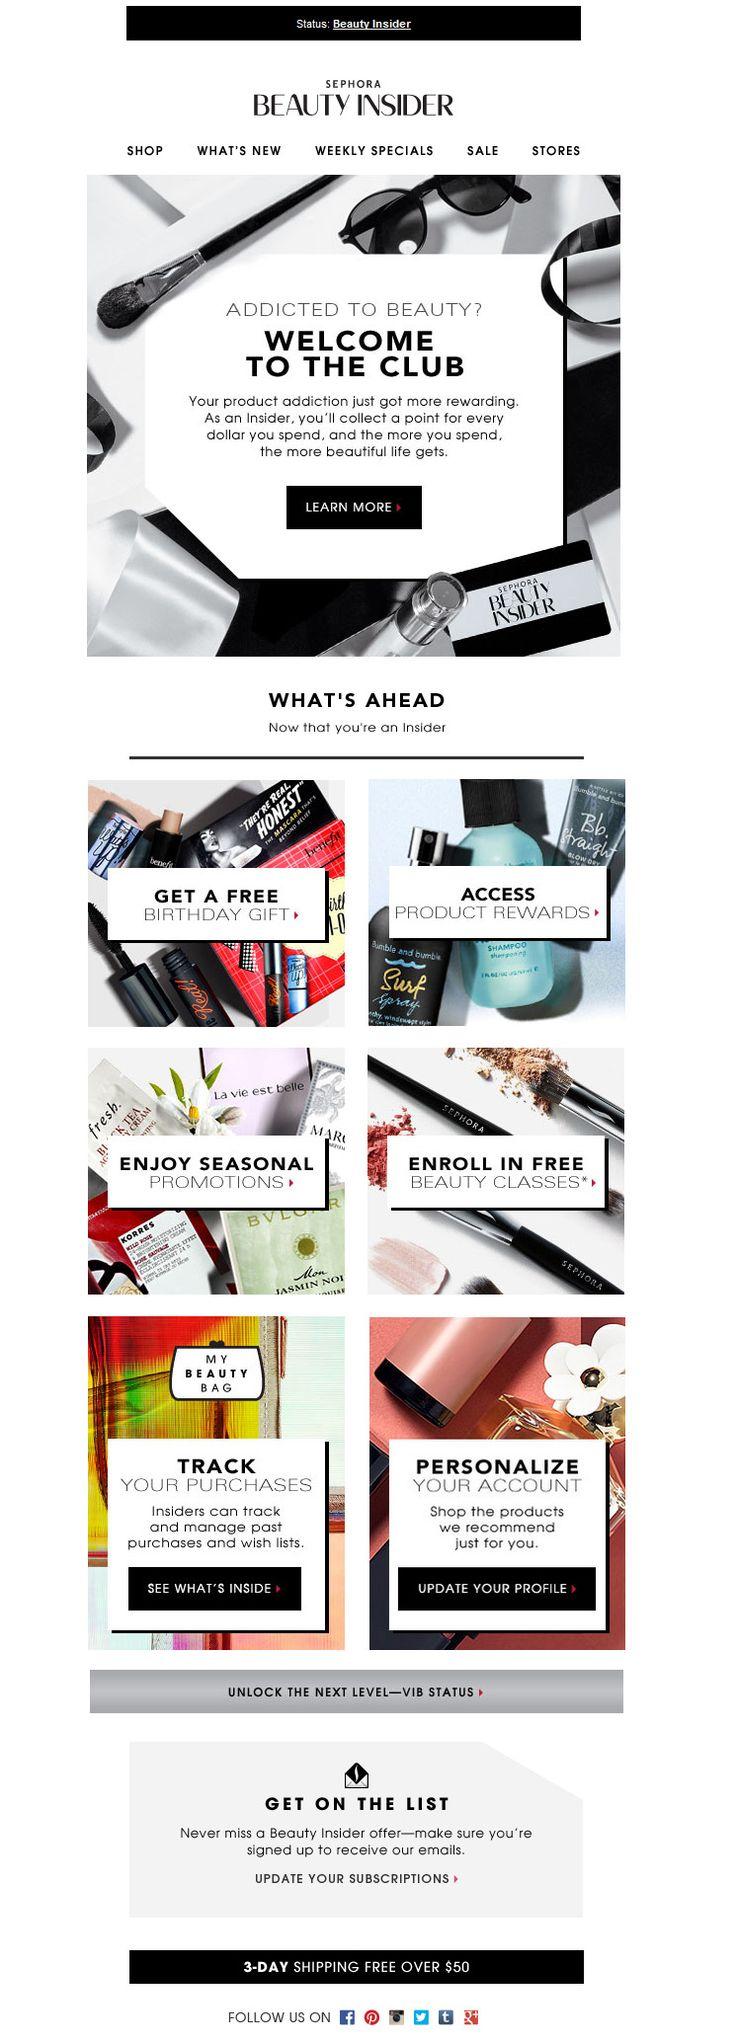 Beauty Insider - Sephora  | welcome | WelcomeEmails | emailmarketing | email | newsletter | welcome newsletter | welcome email | WelcomeEmail | relationship emails | emailDesign